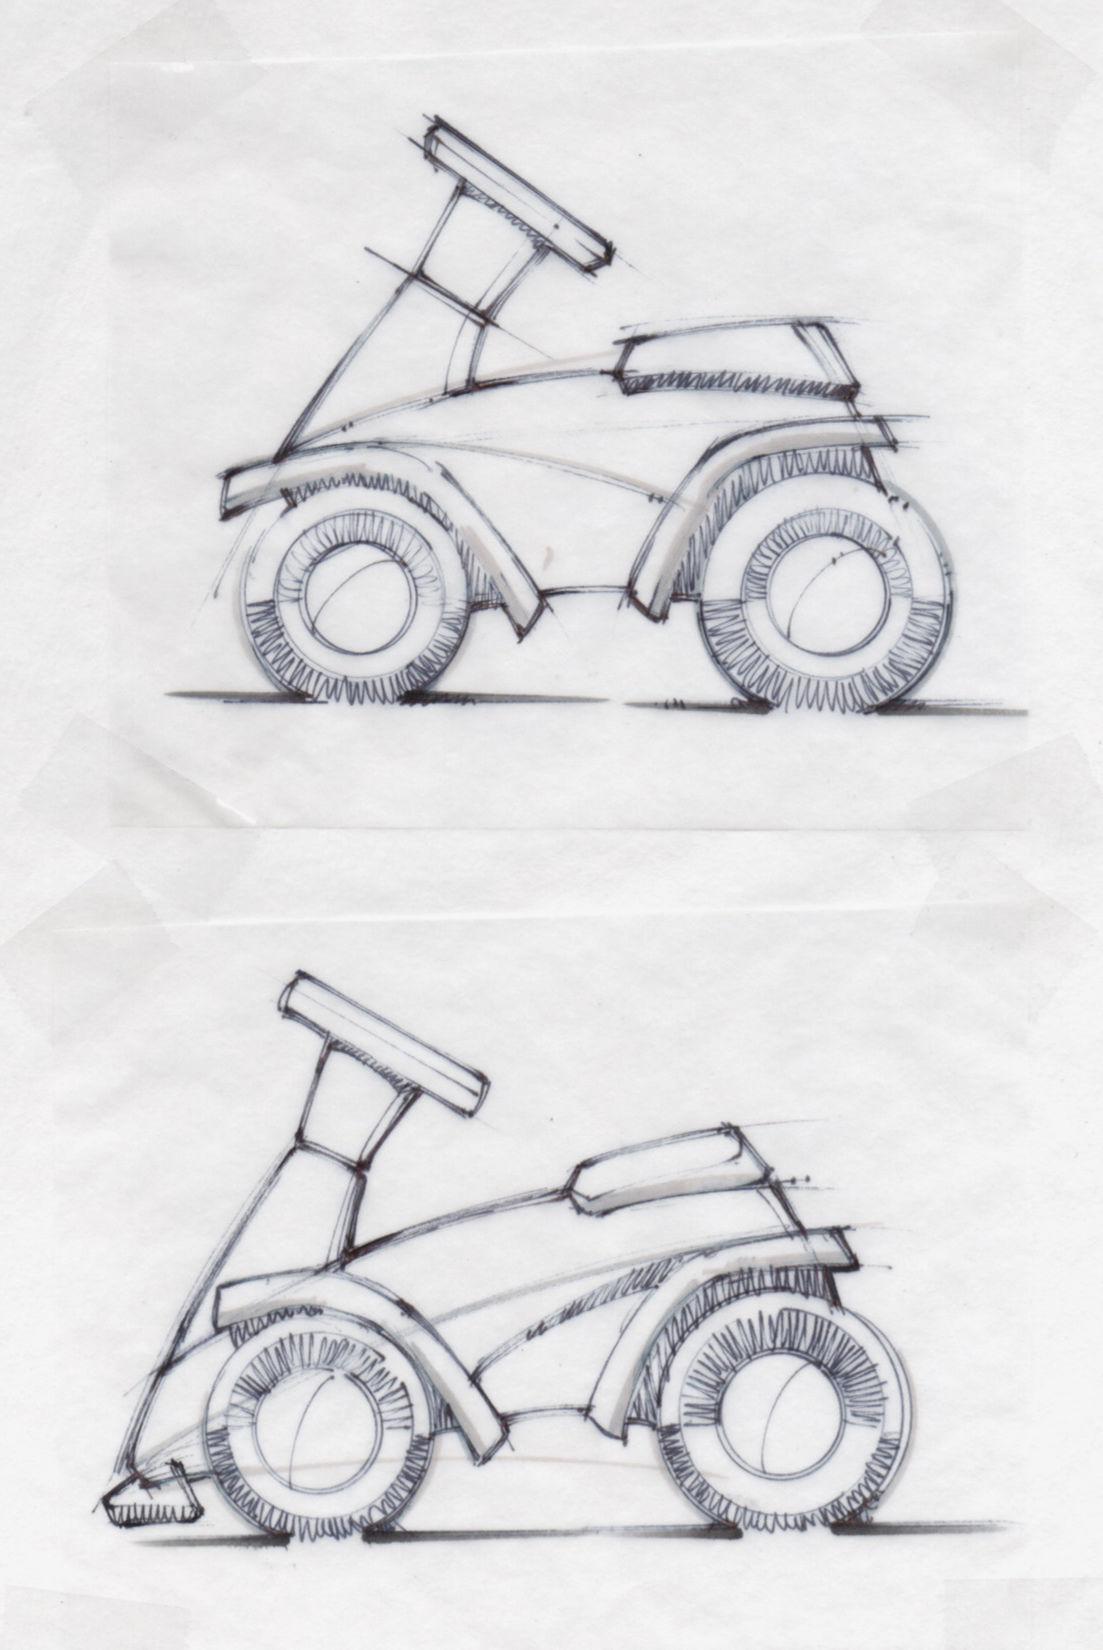 Ride-on-1-1-3500-3500